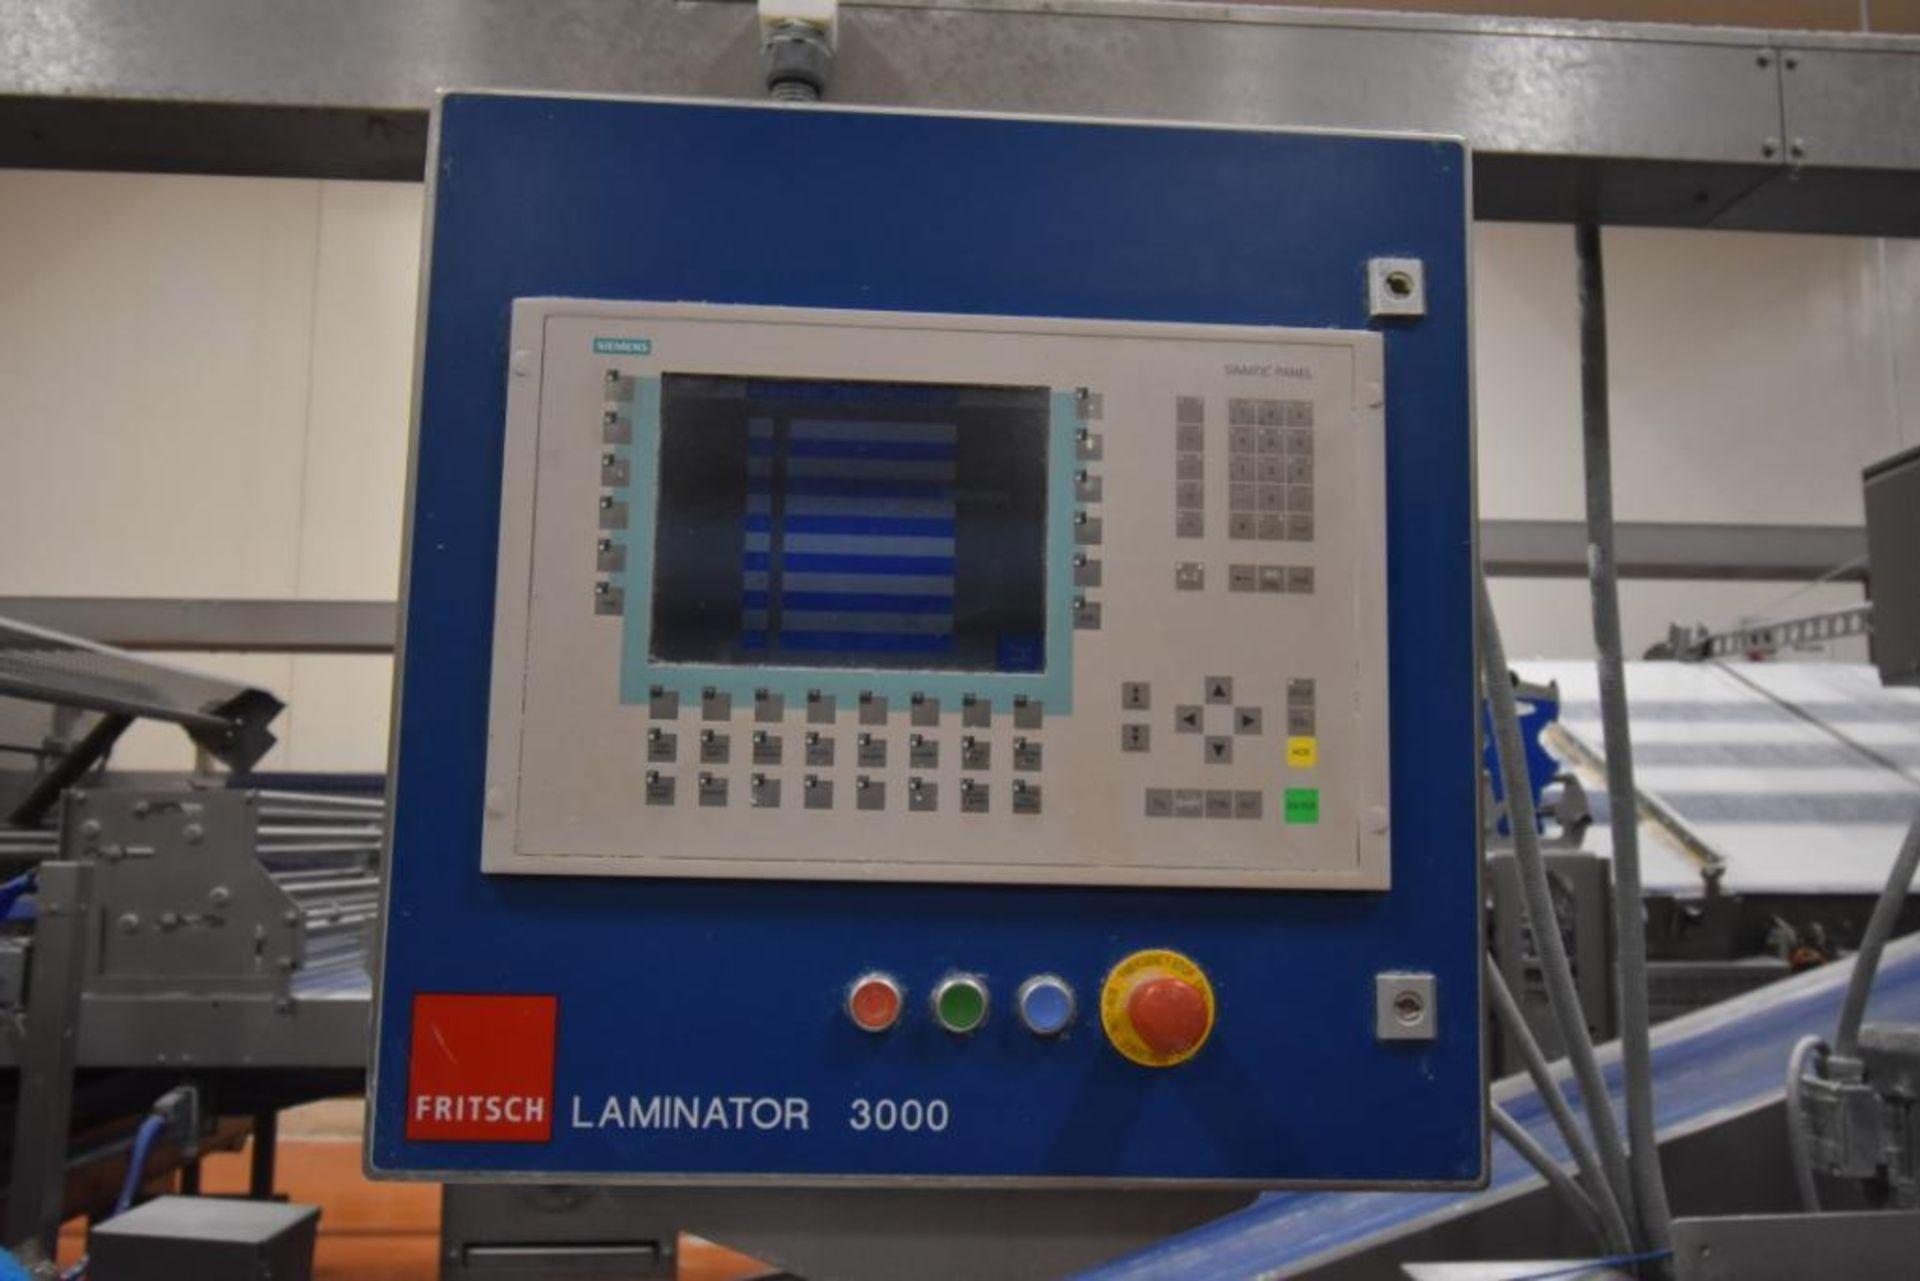 2007 Fritsch Laminator 3000 dough line - Image 85 of 280